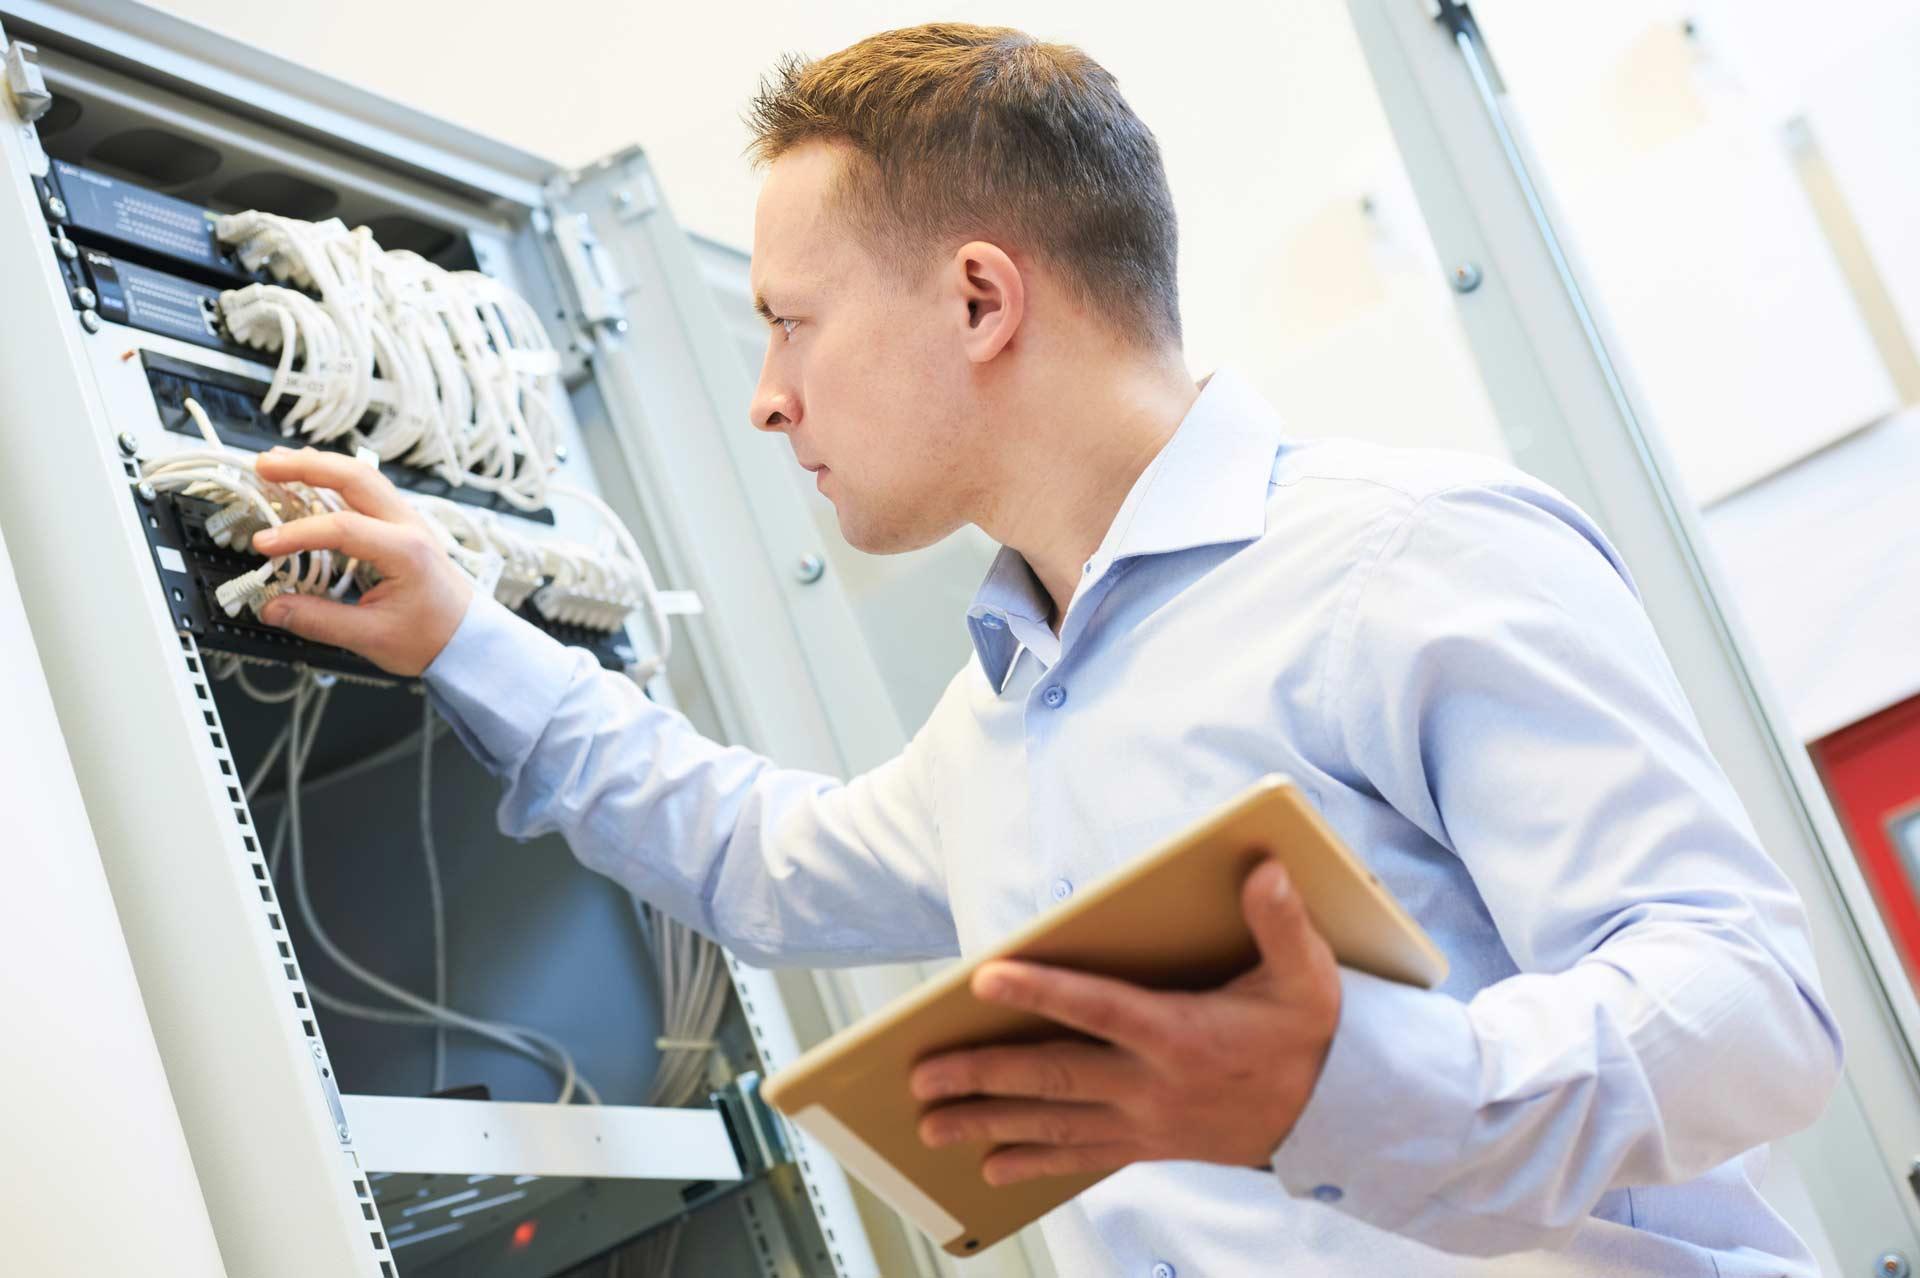 I.T. service provider inspecting a datacentre server